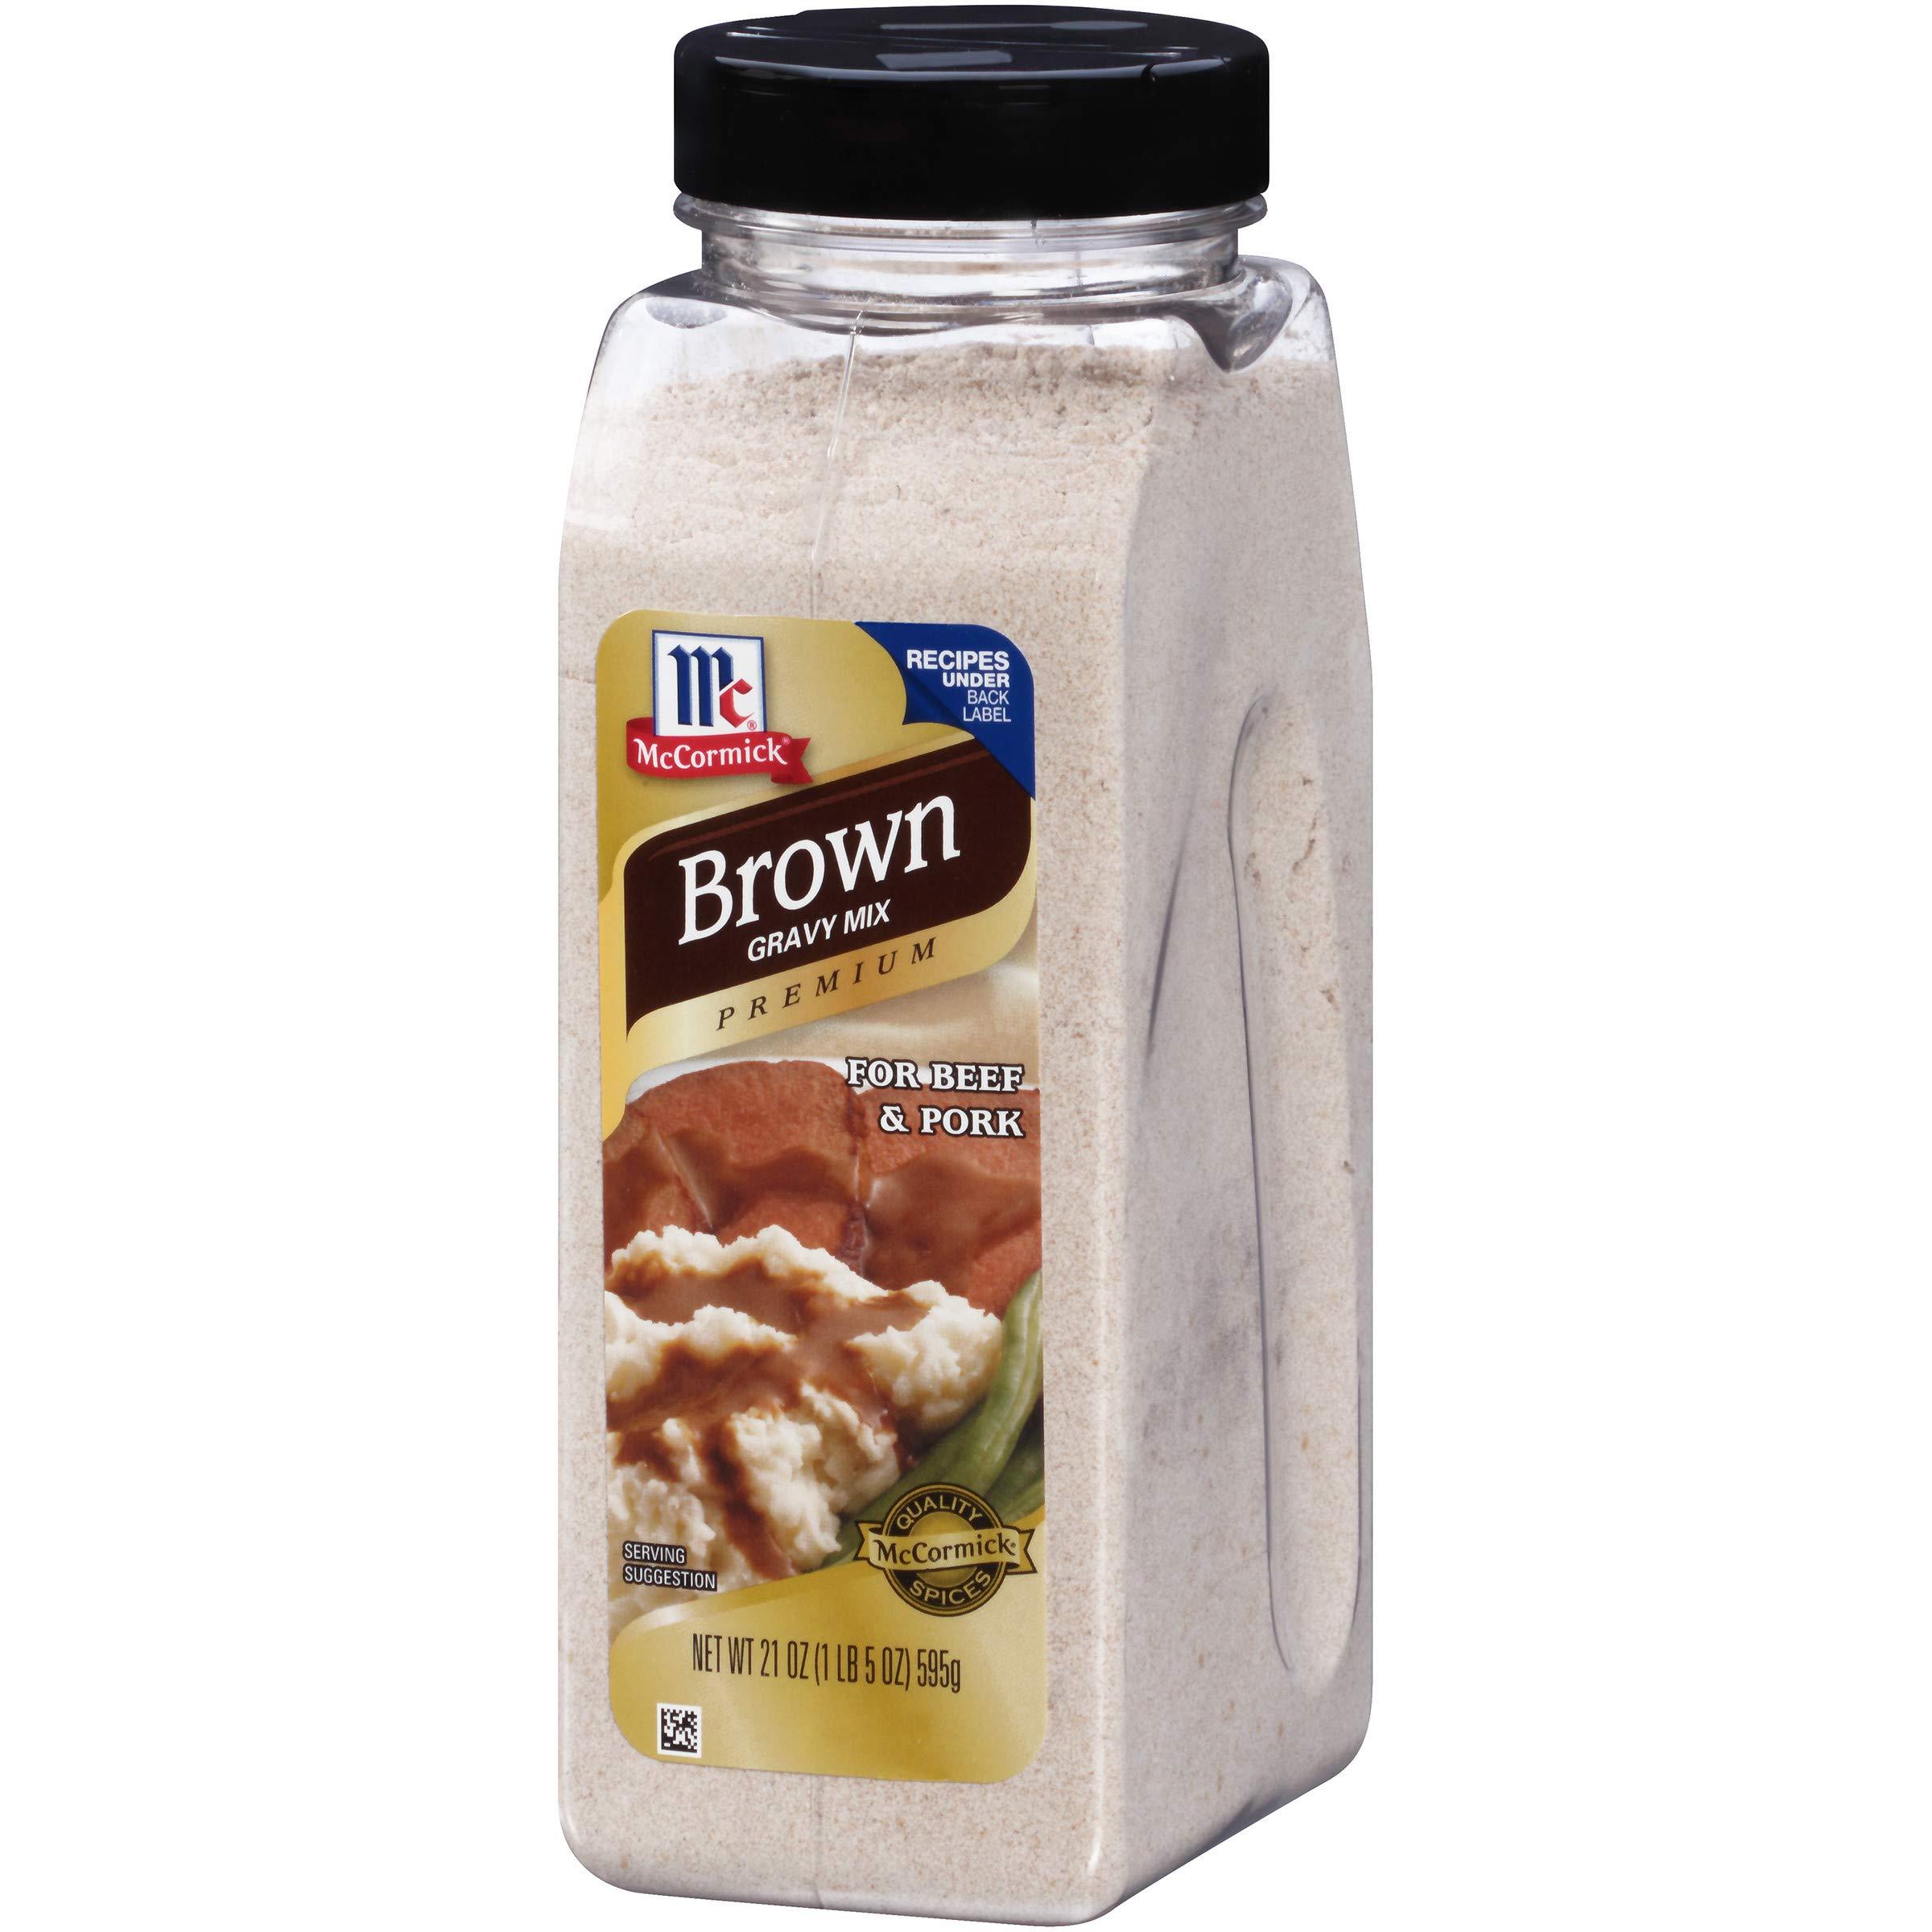 McCormick Premium Brown Gravy Mix, 21 oz